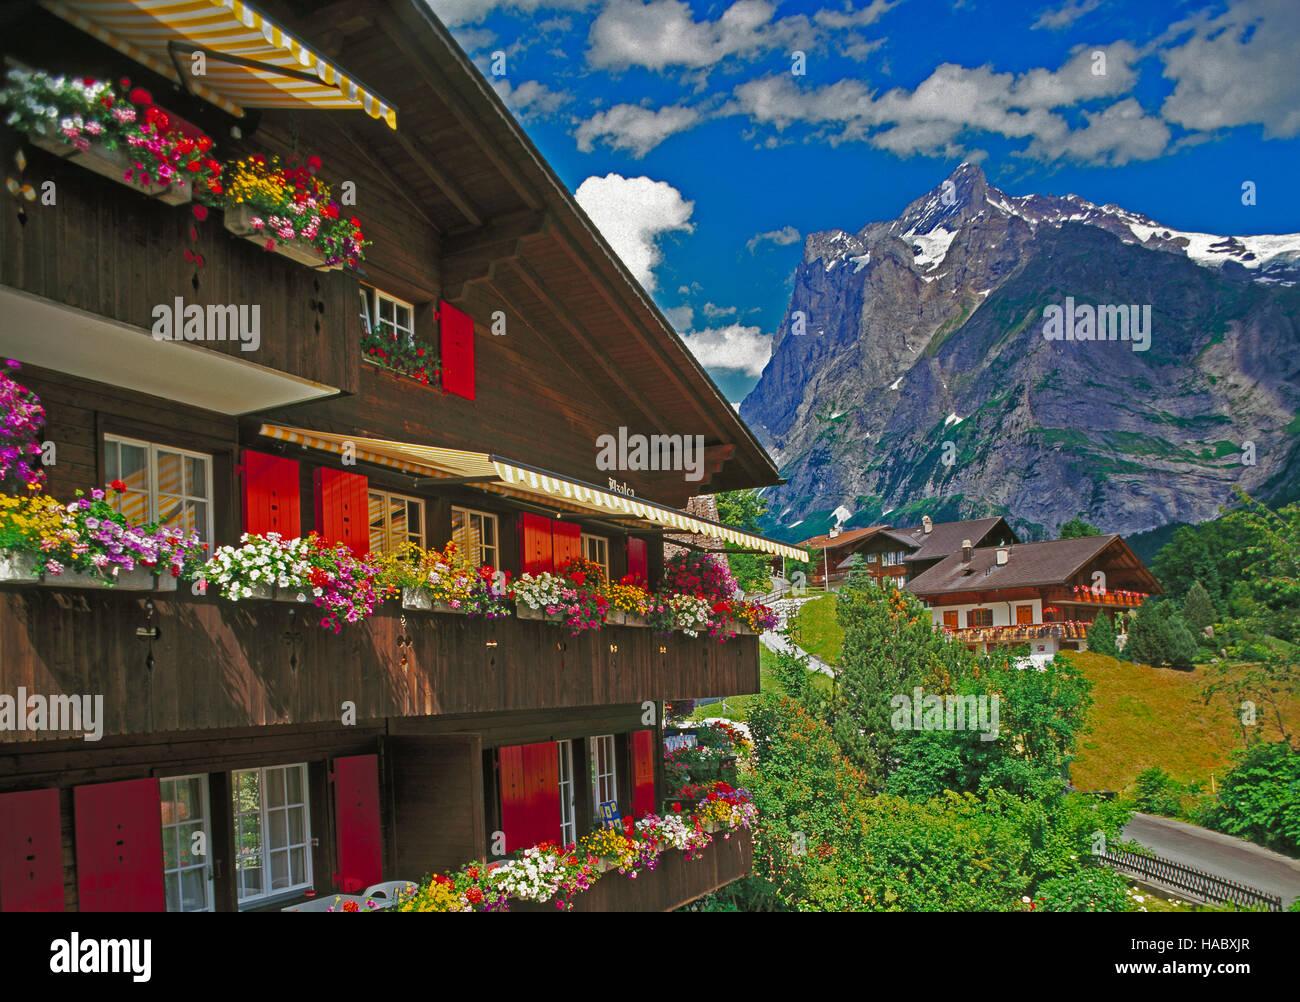 Wetterhorn and Chalet at Grindelwald, Bernese Oberland, Switzerland - Stock Image